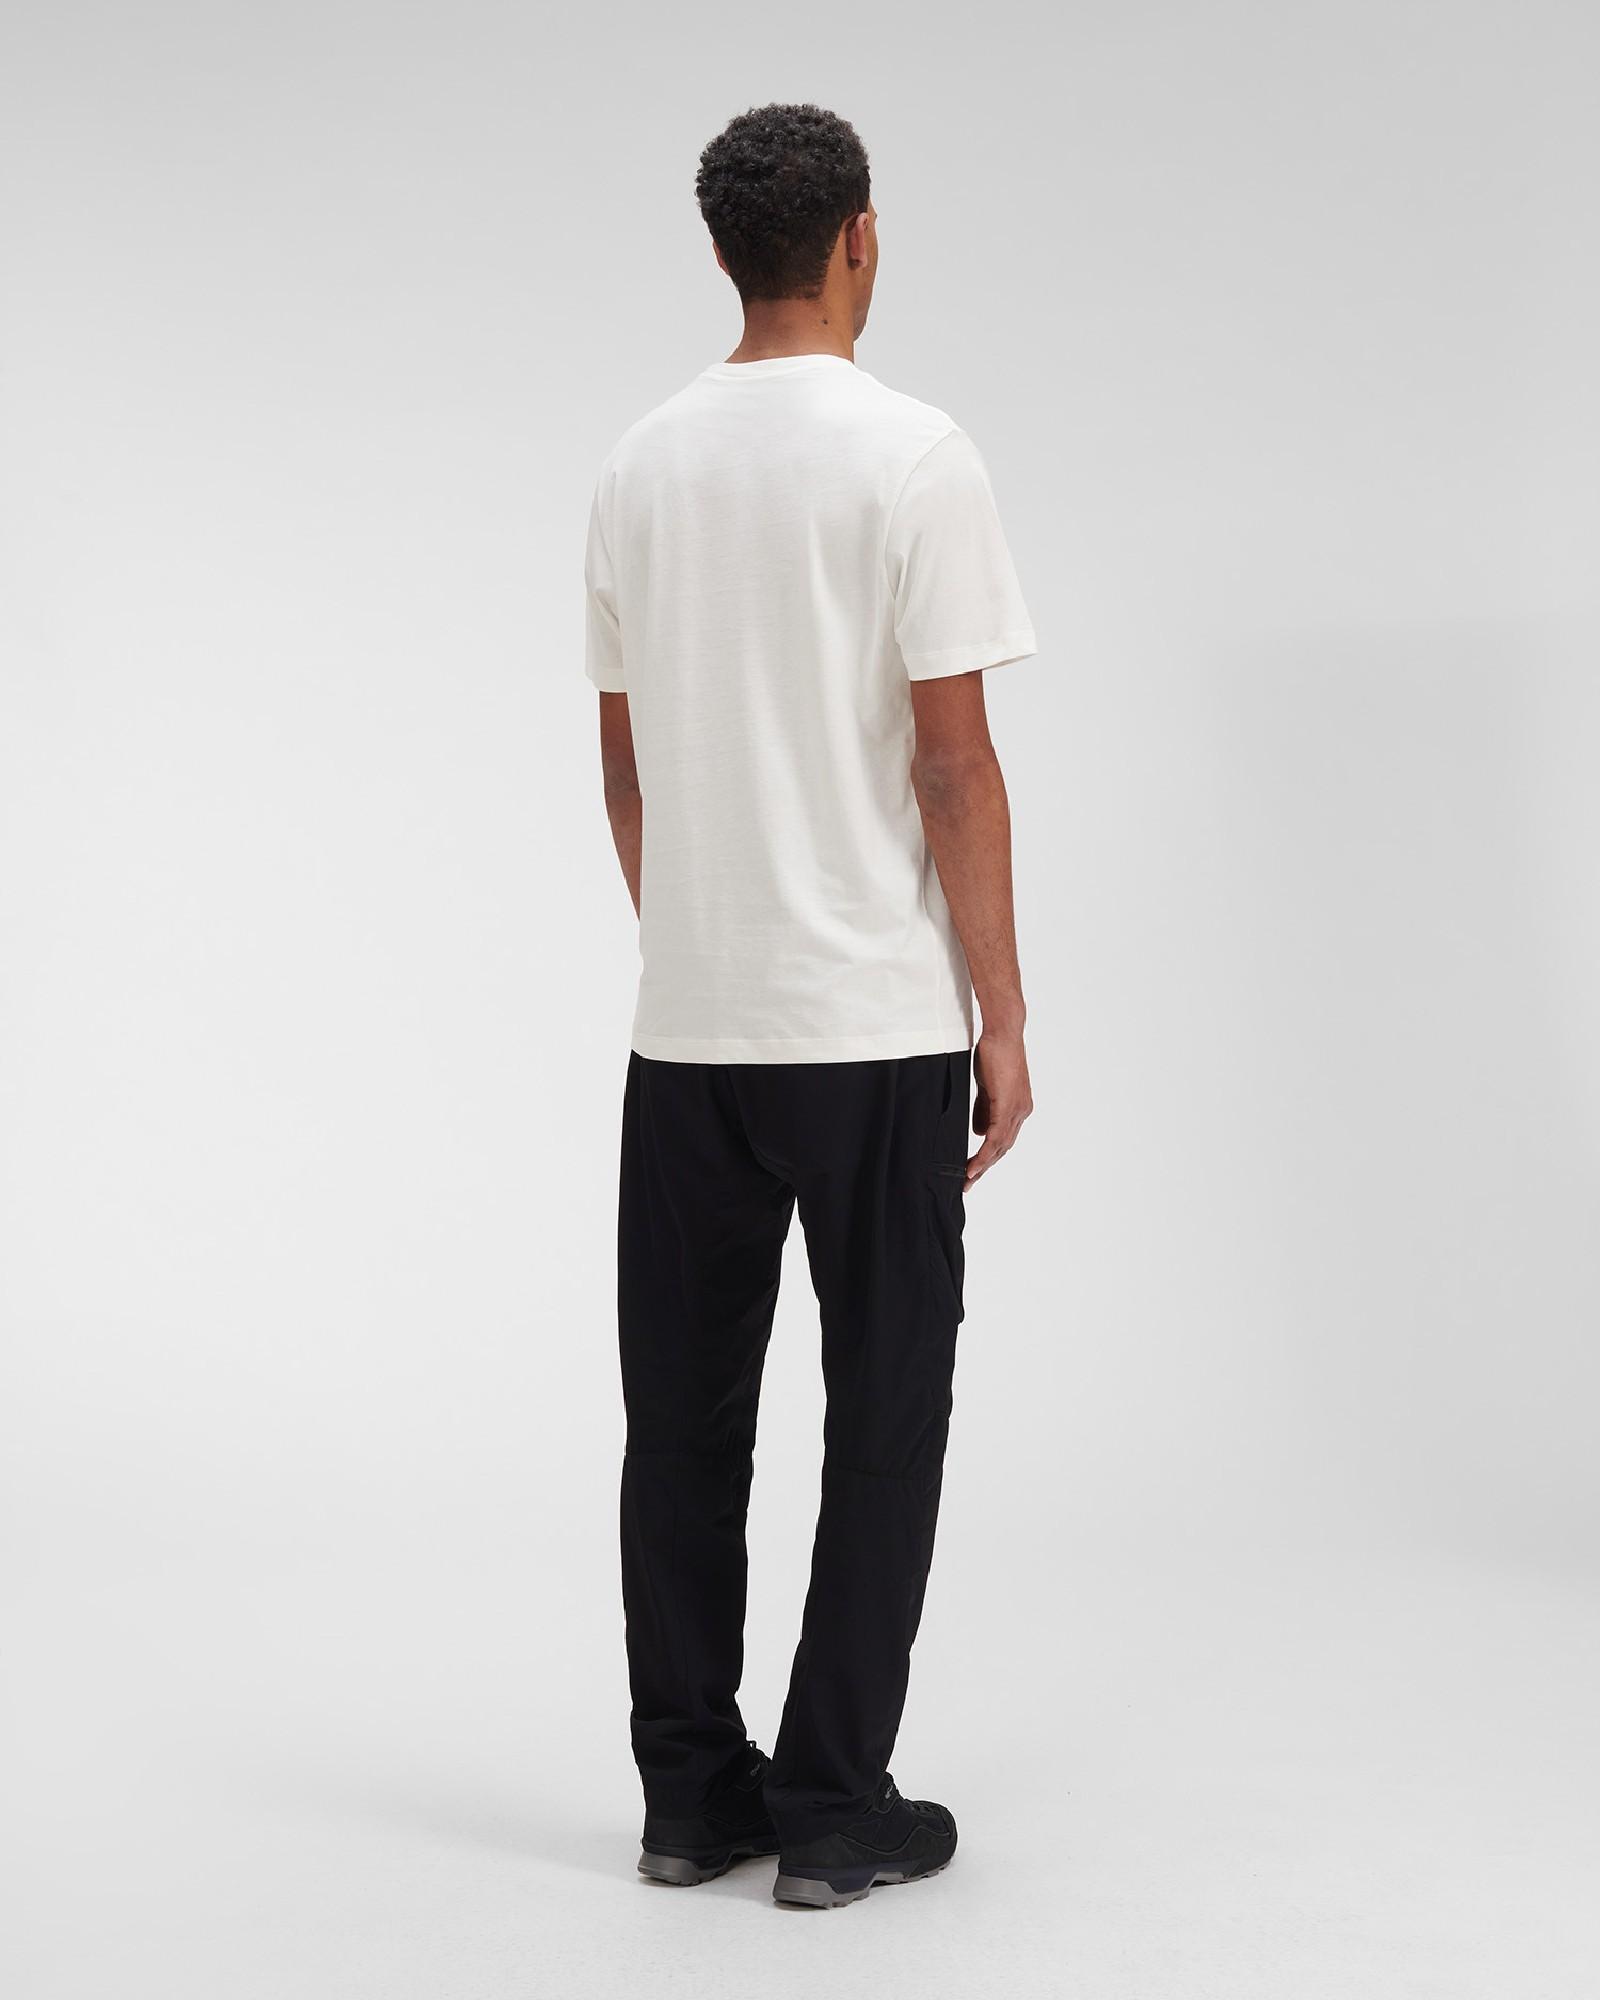 C.P. COMPANY | T-shirt | MTS200A00 6011W103